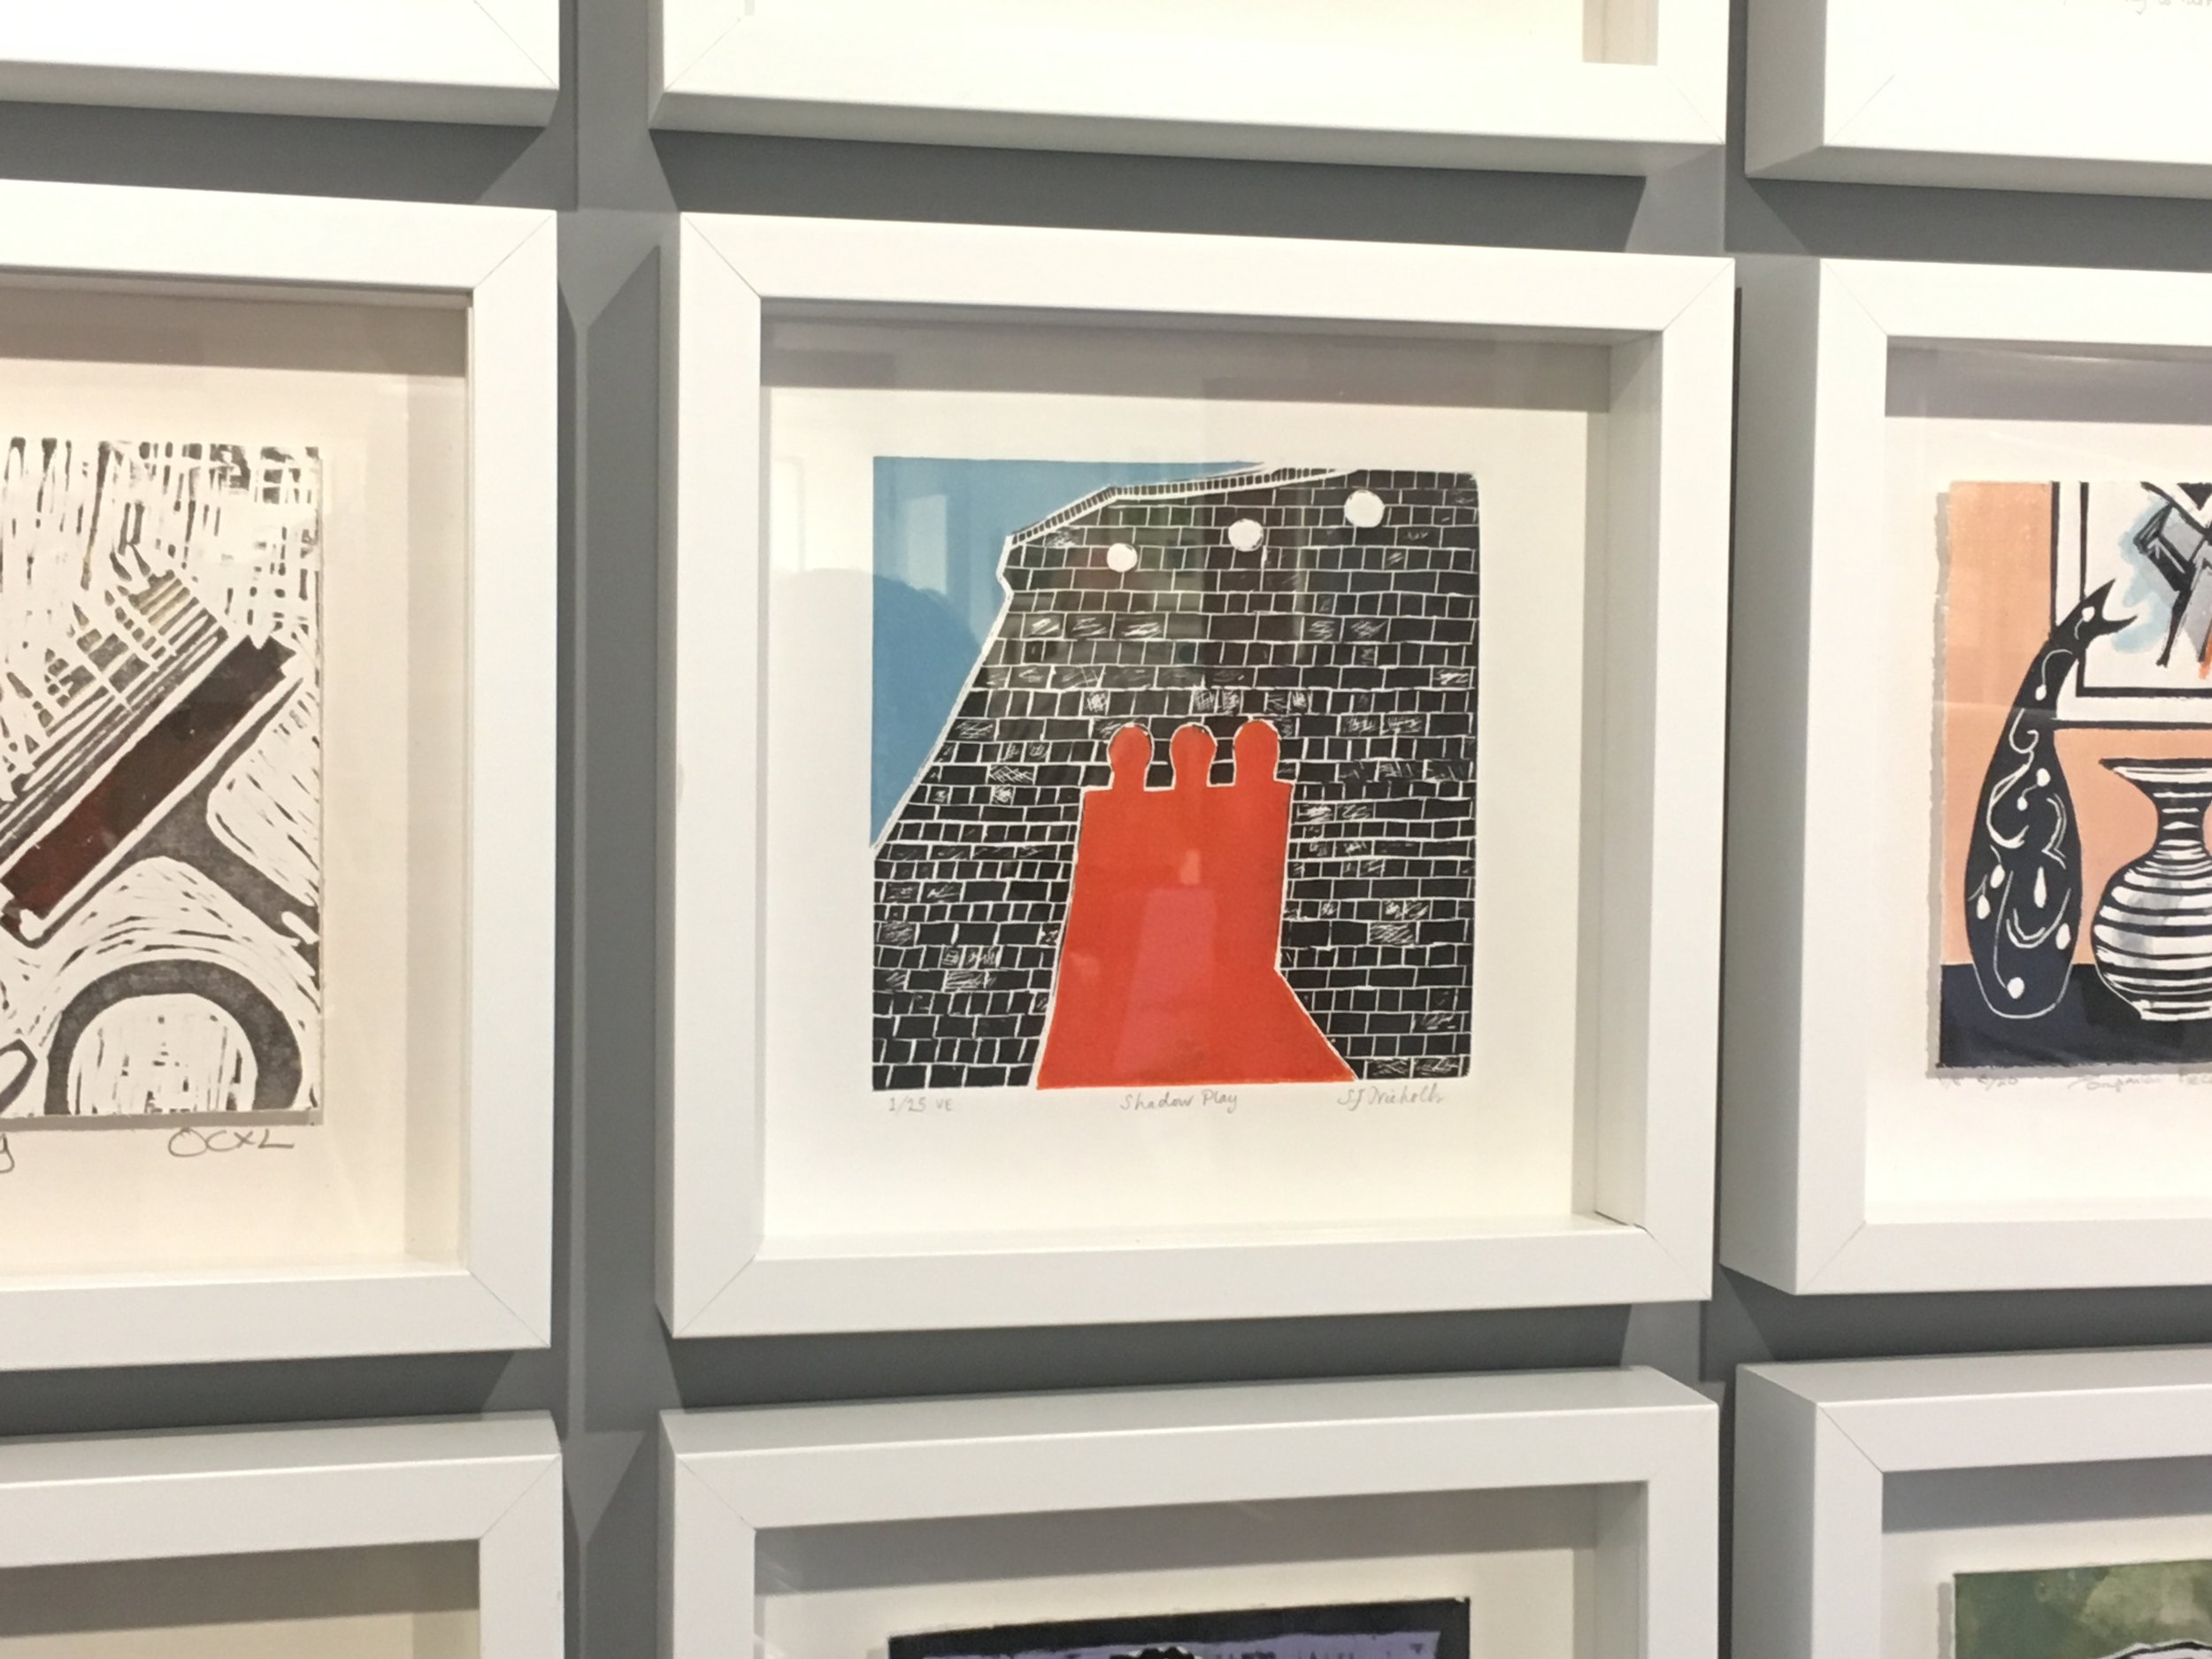 Happenstance Print Exhibition at Parndon Mill